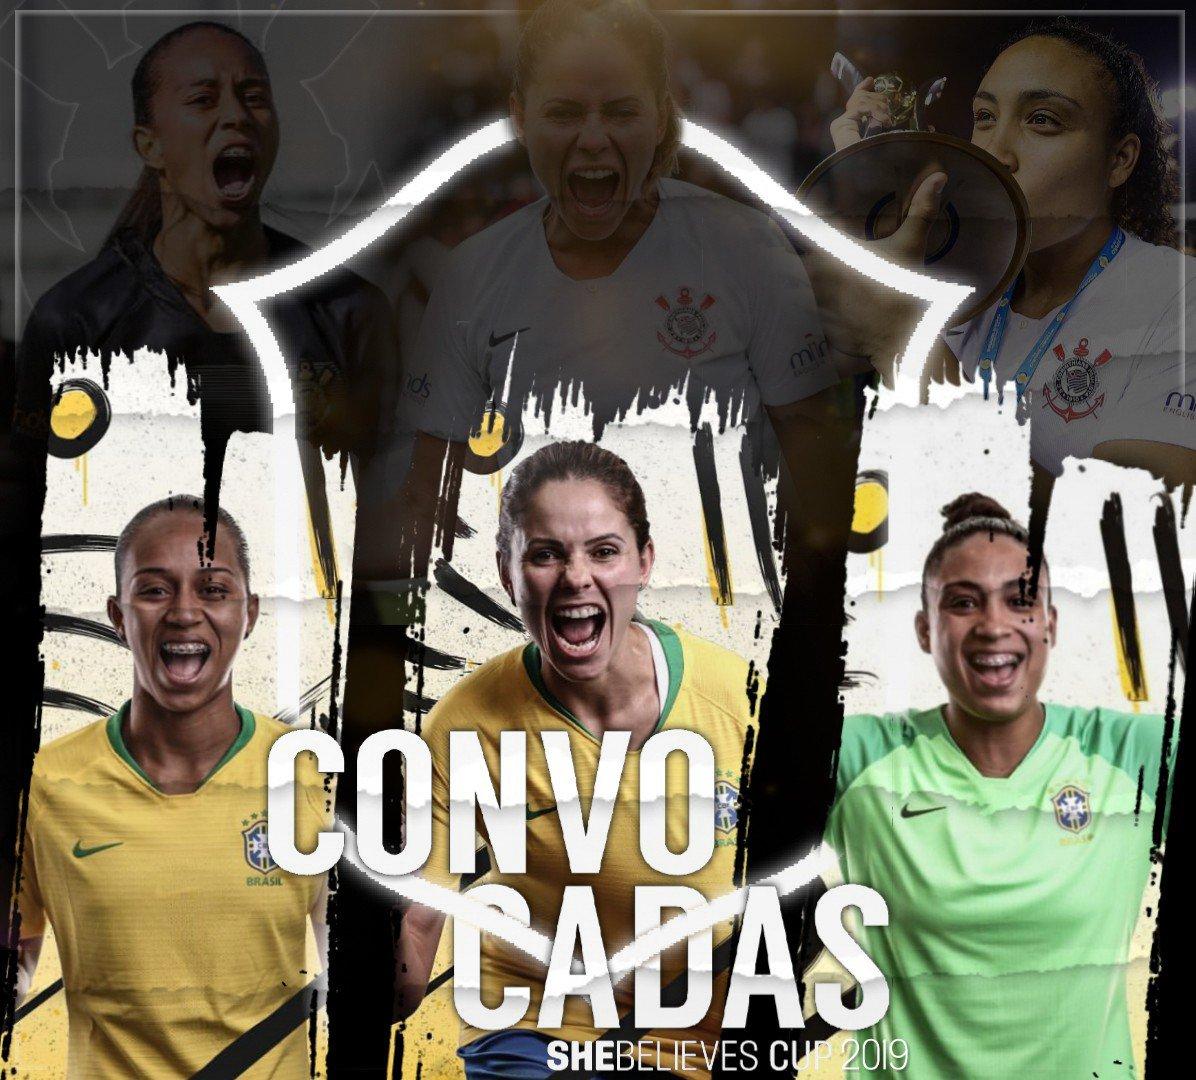 Portal Corinthians Futebol Feminino's photo on Corinthians